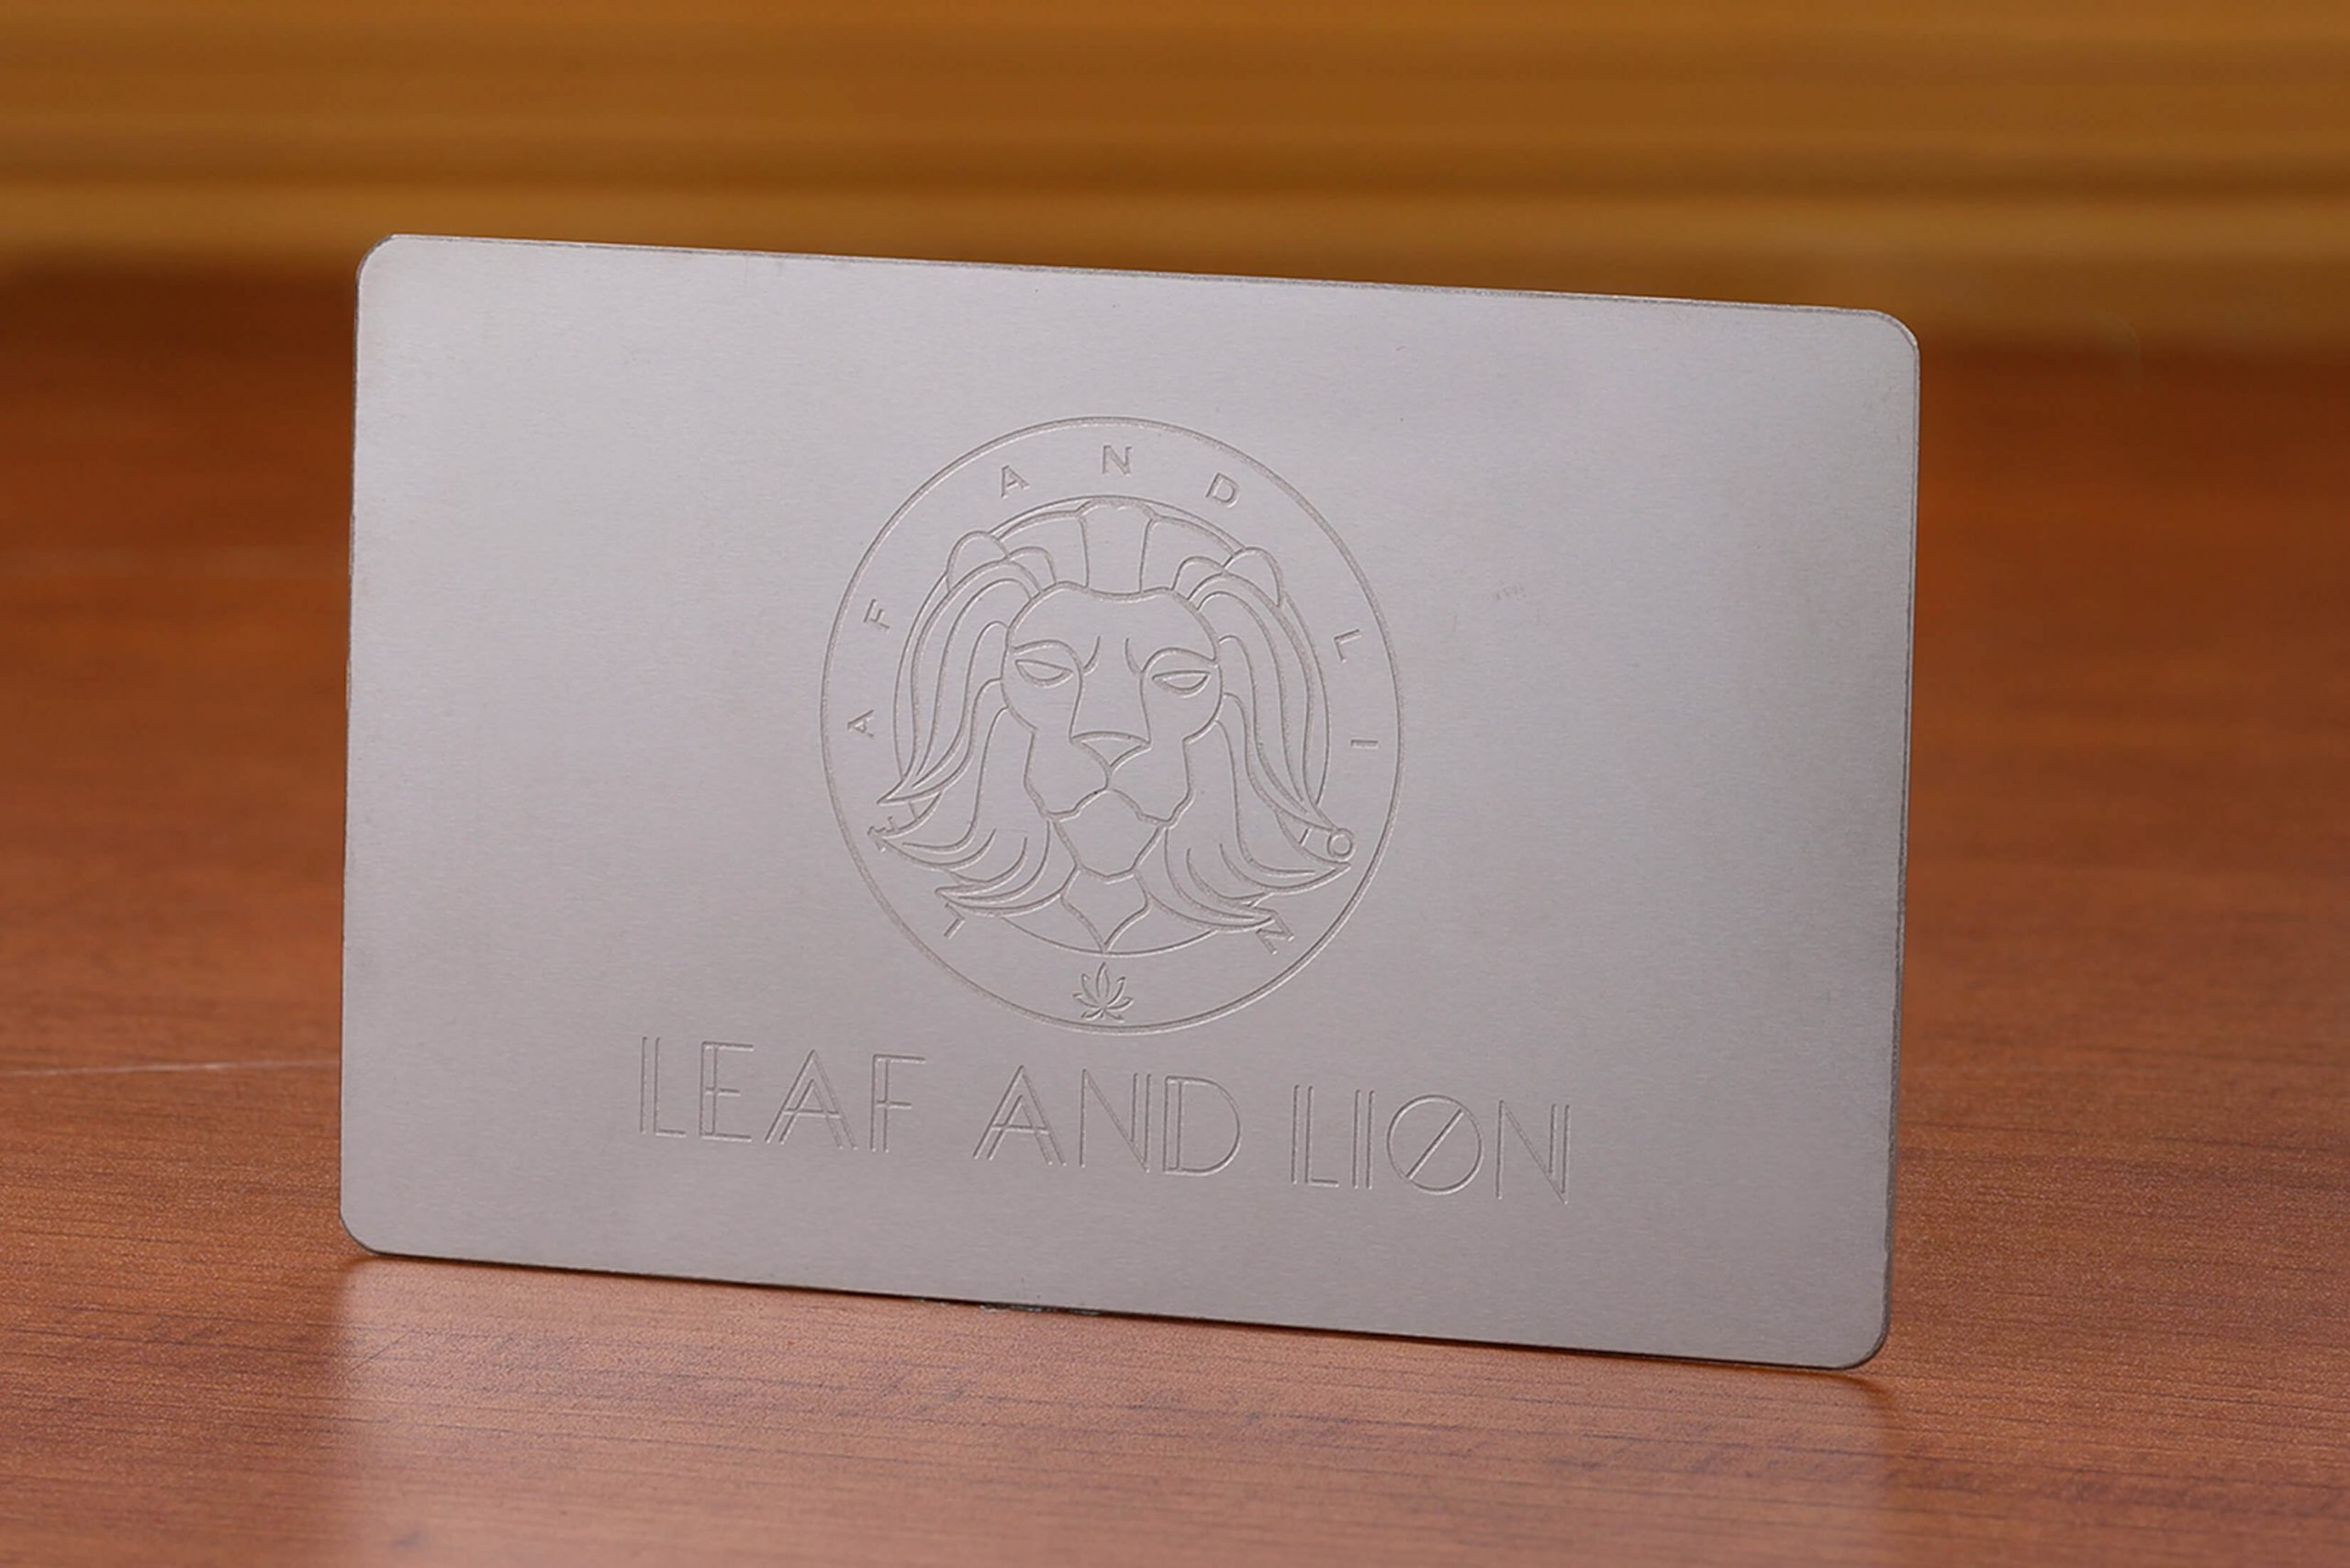 lion quick print business card